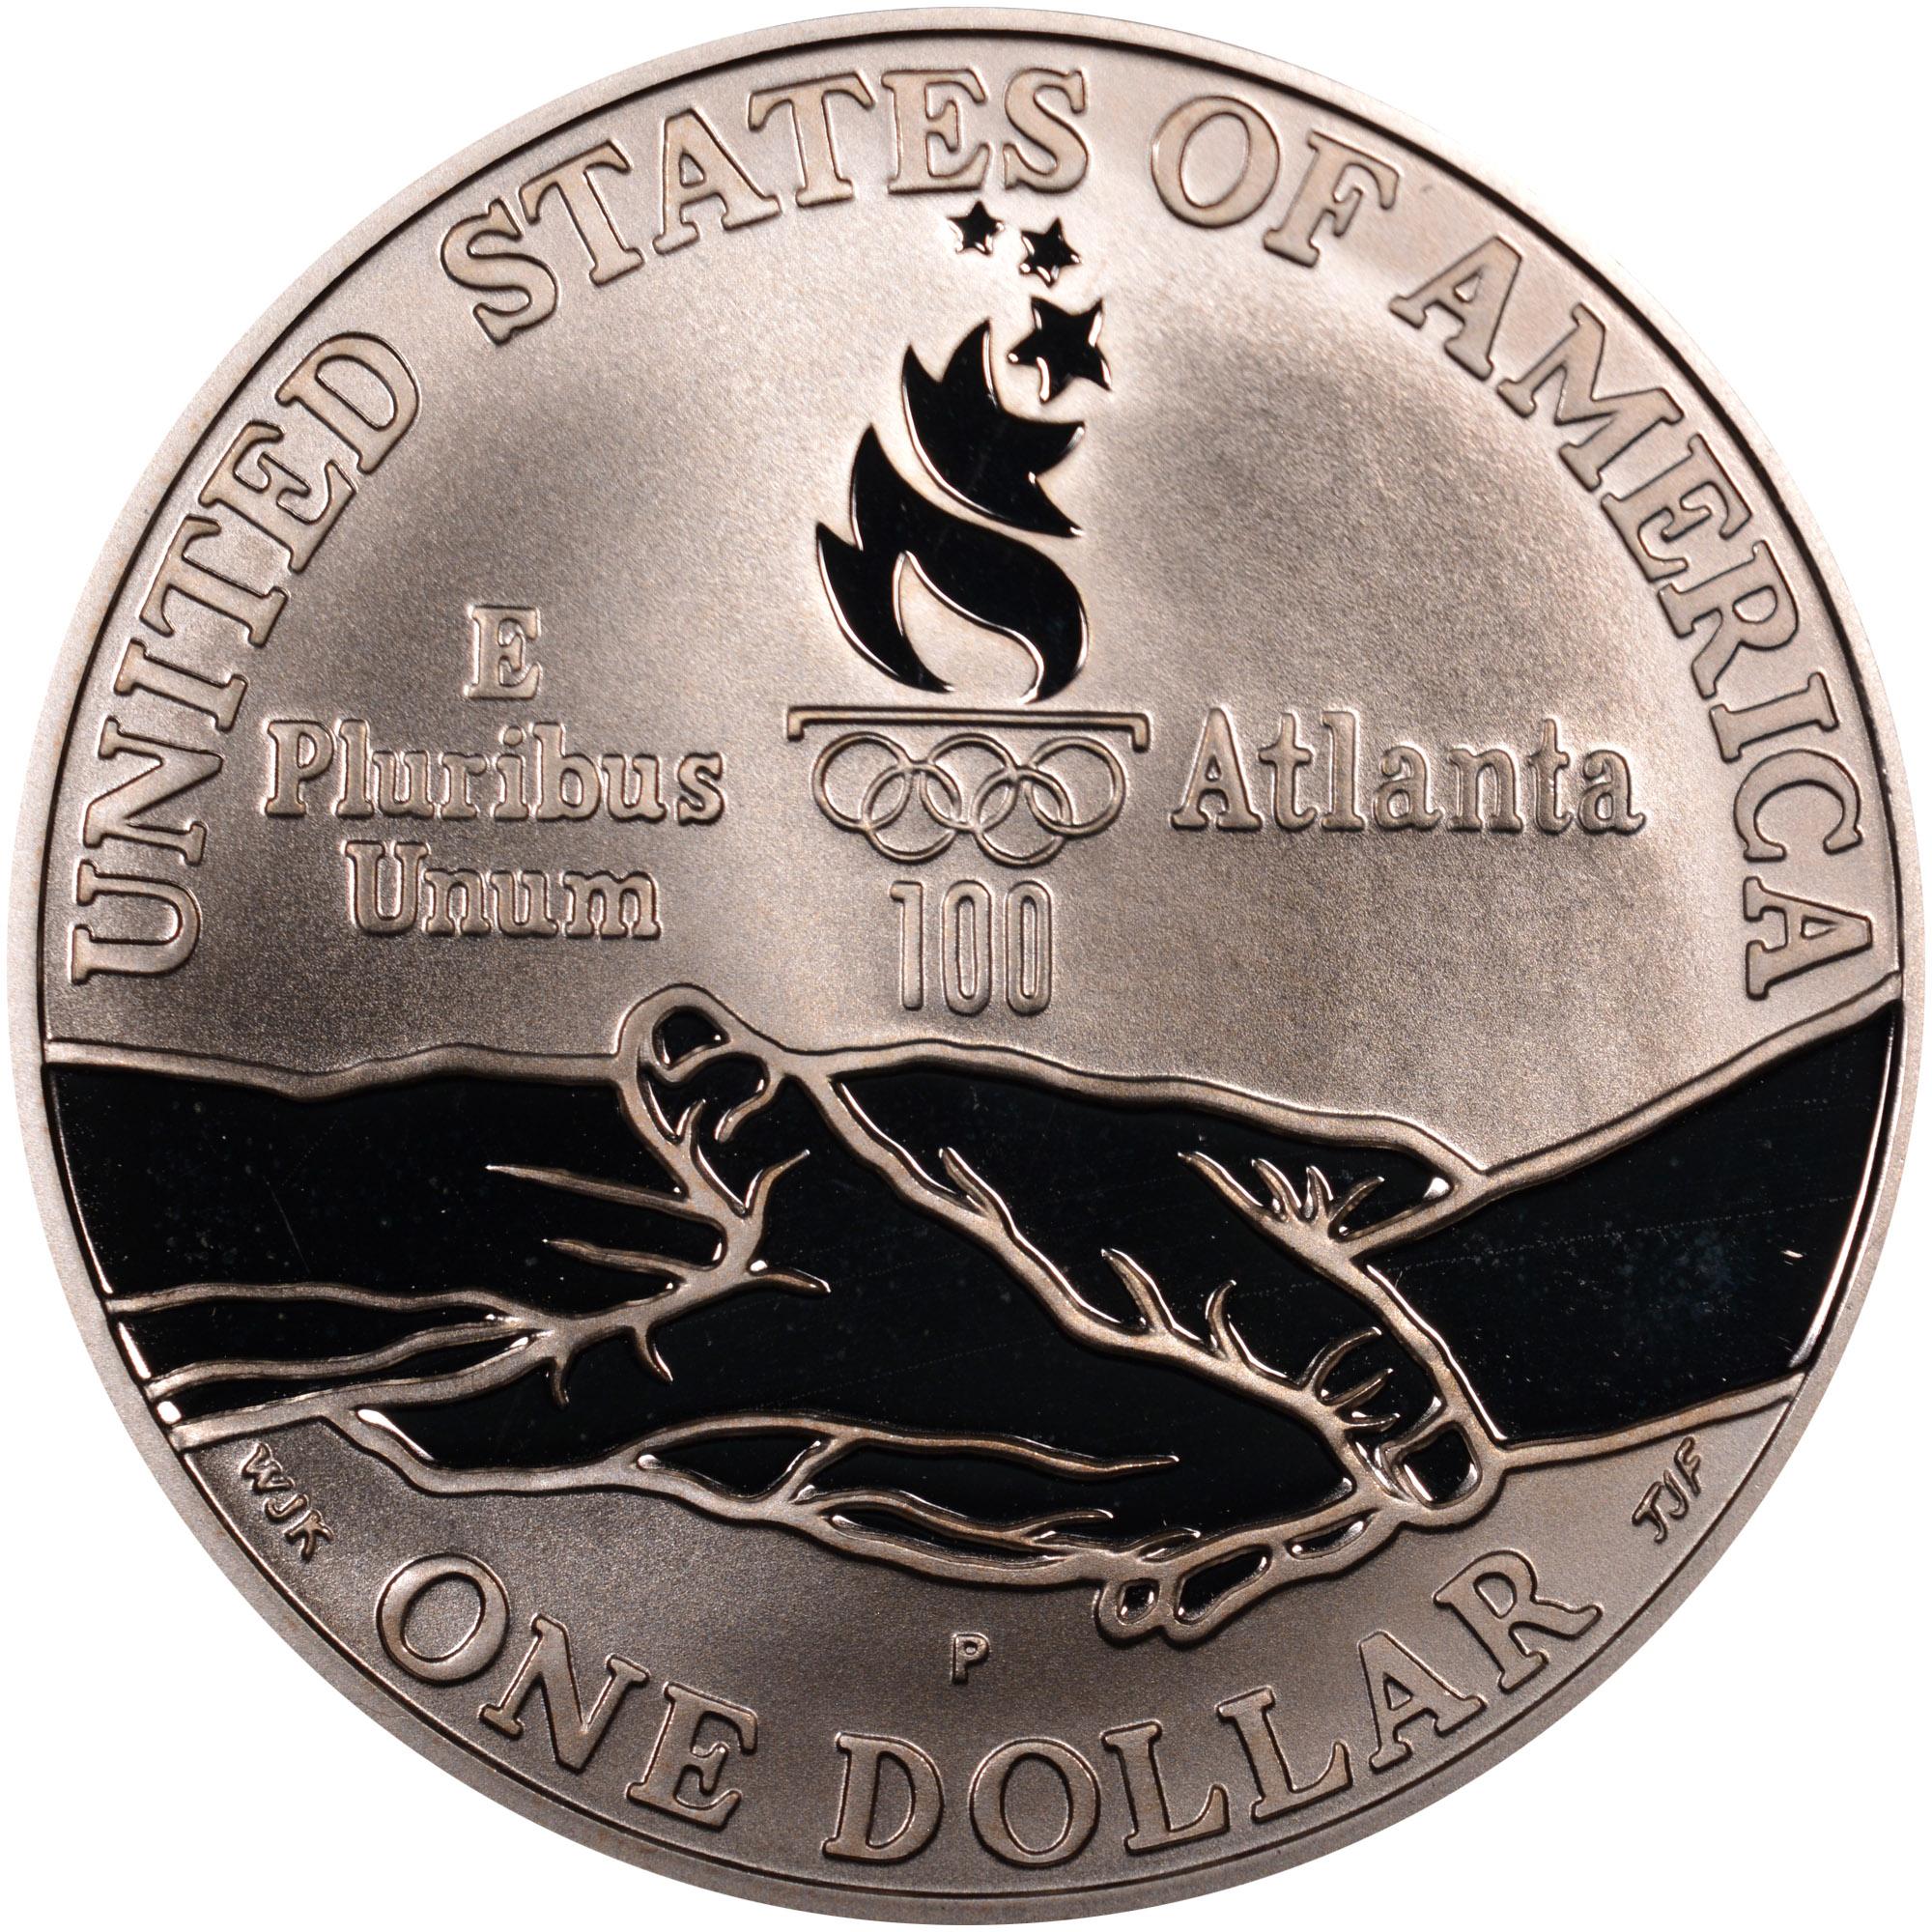 1995 P $1 XXVI Olympics Cycling Commemorative Silver Dollar NGC PF69 UC